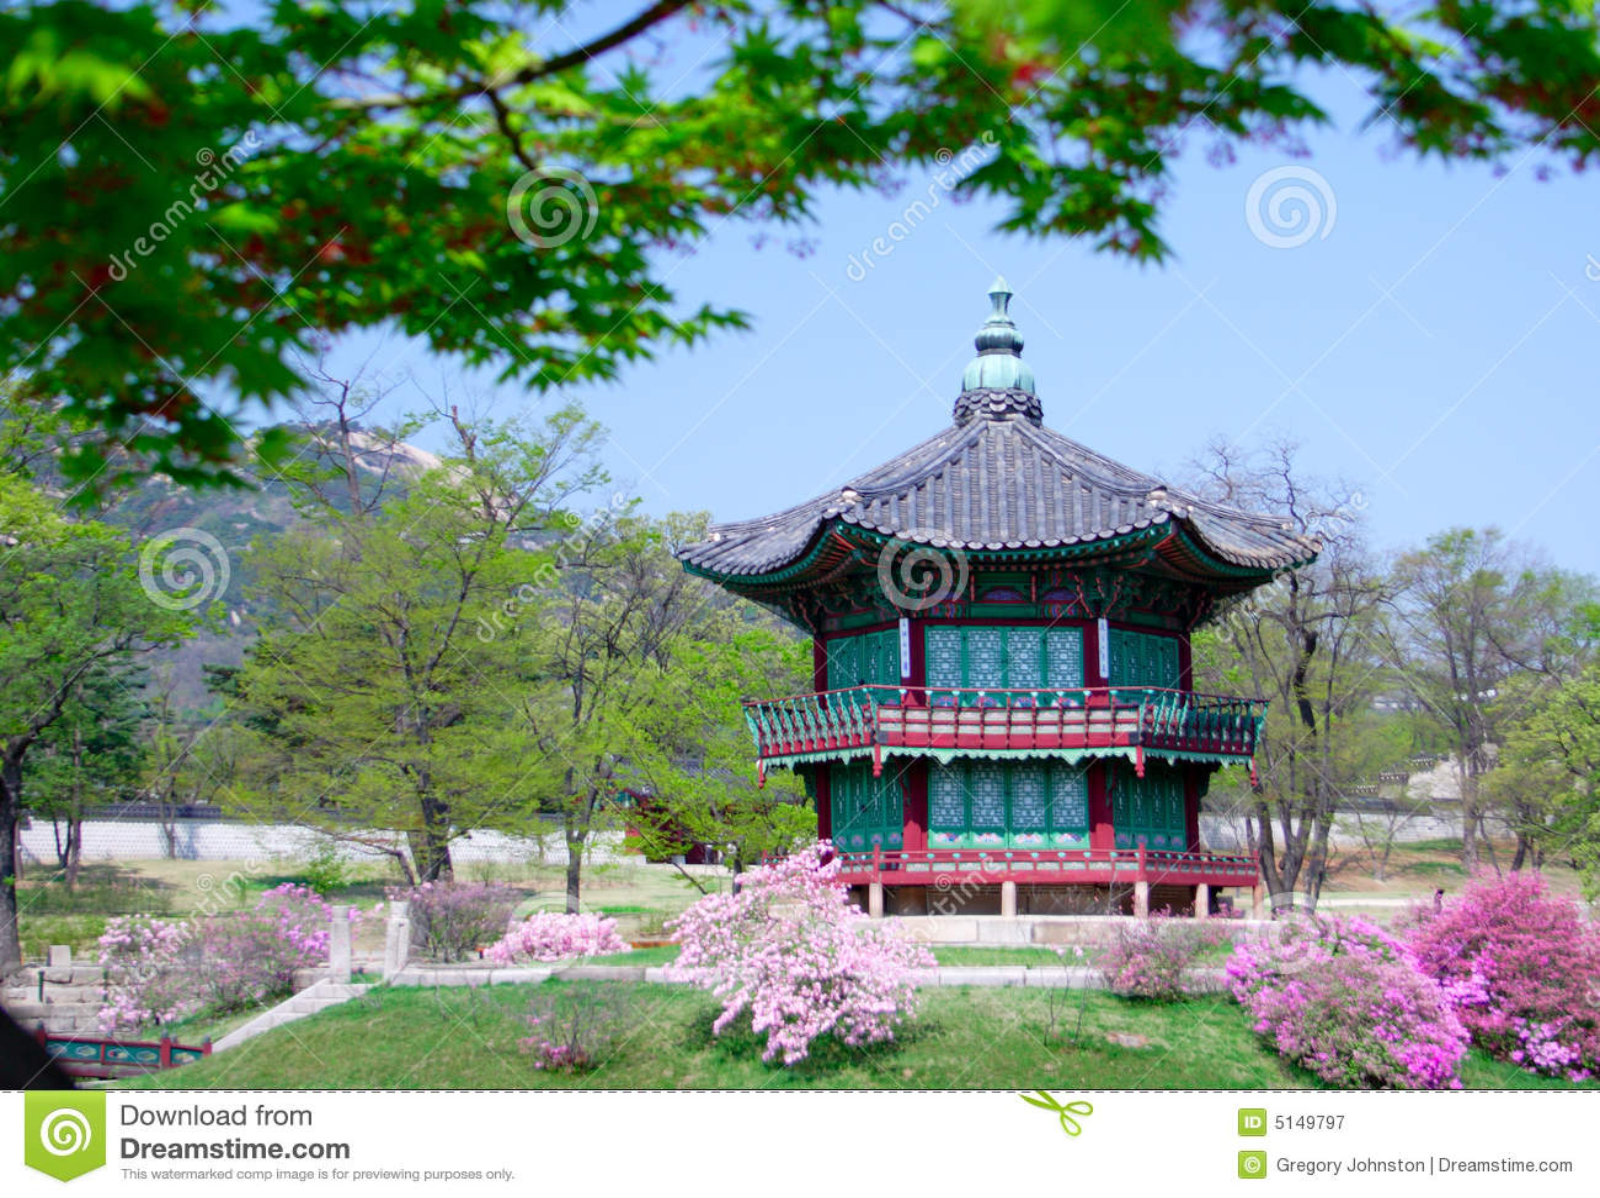 Ein altes historisches pavillion in Seoul, Korea.